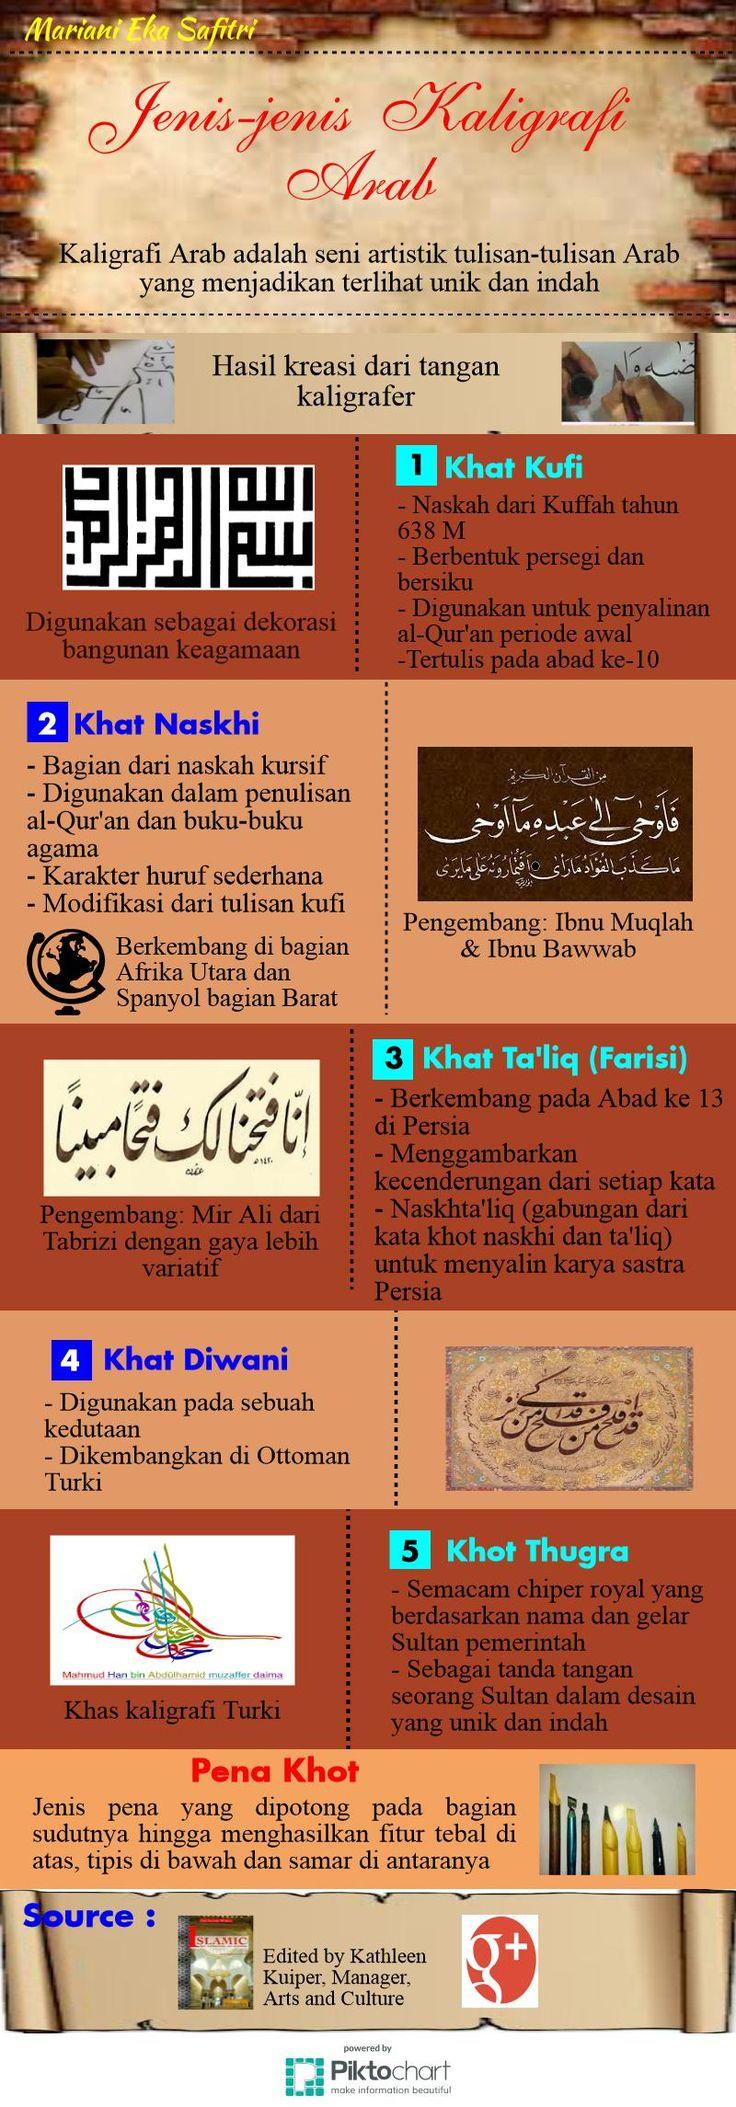 #kaligrafi #arab #kaligrafiarab #islam #caligraphy #islamic #art#jenis#macam#khat#bentuk#khat#kaligrafi